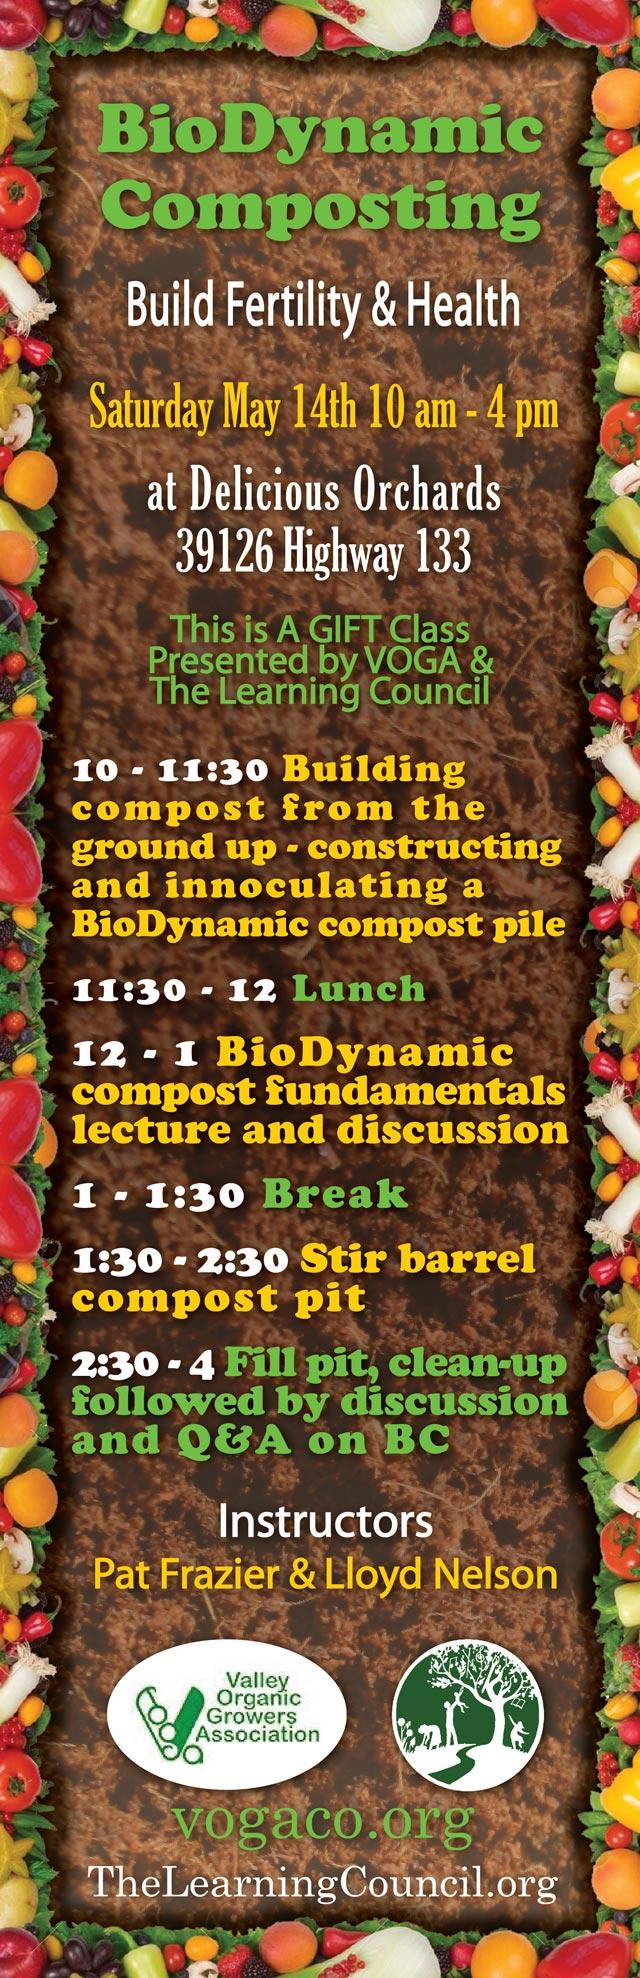 Biodynamic Composting poster